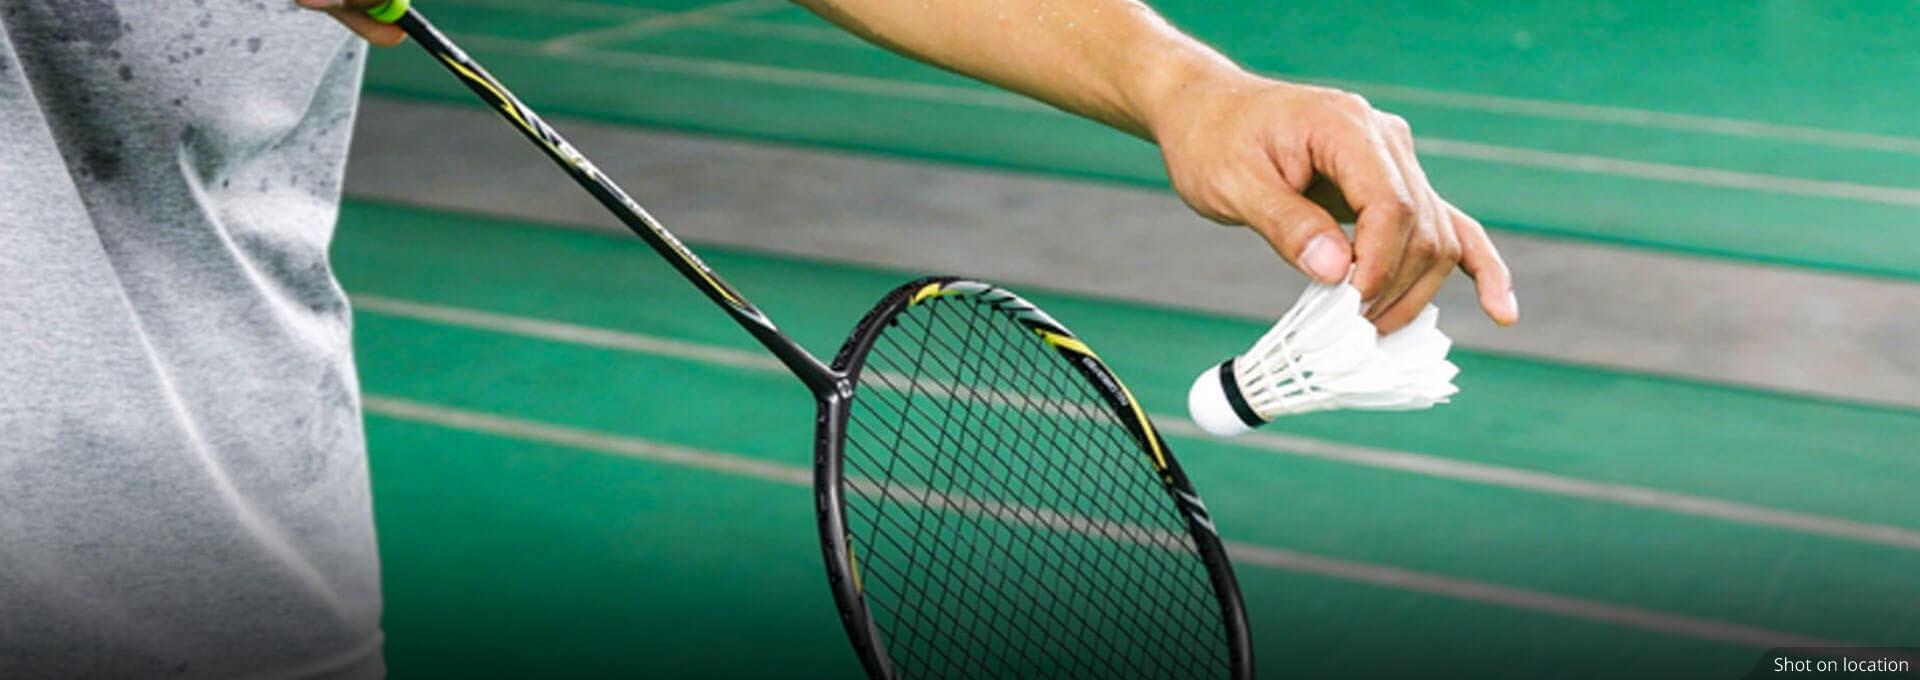 torino bannerghatta badminton